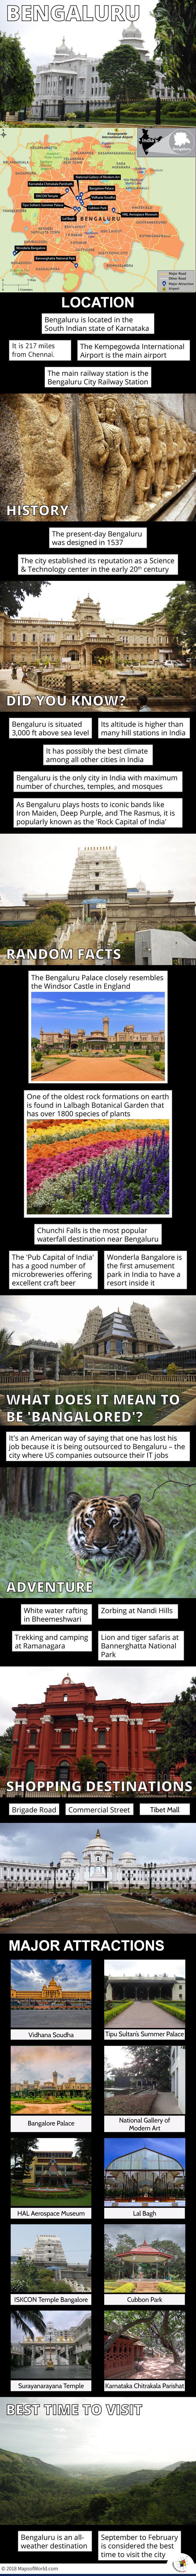 Infographic Depicting Bengaluru Tourist Attractions